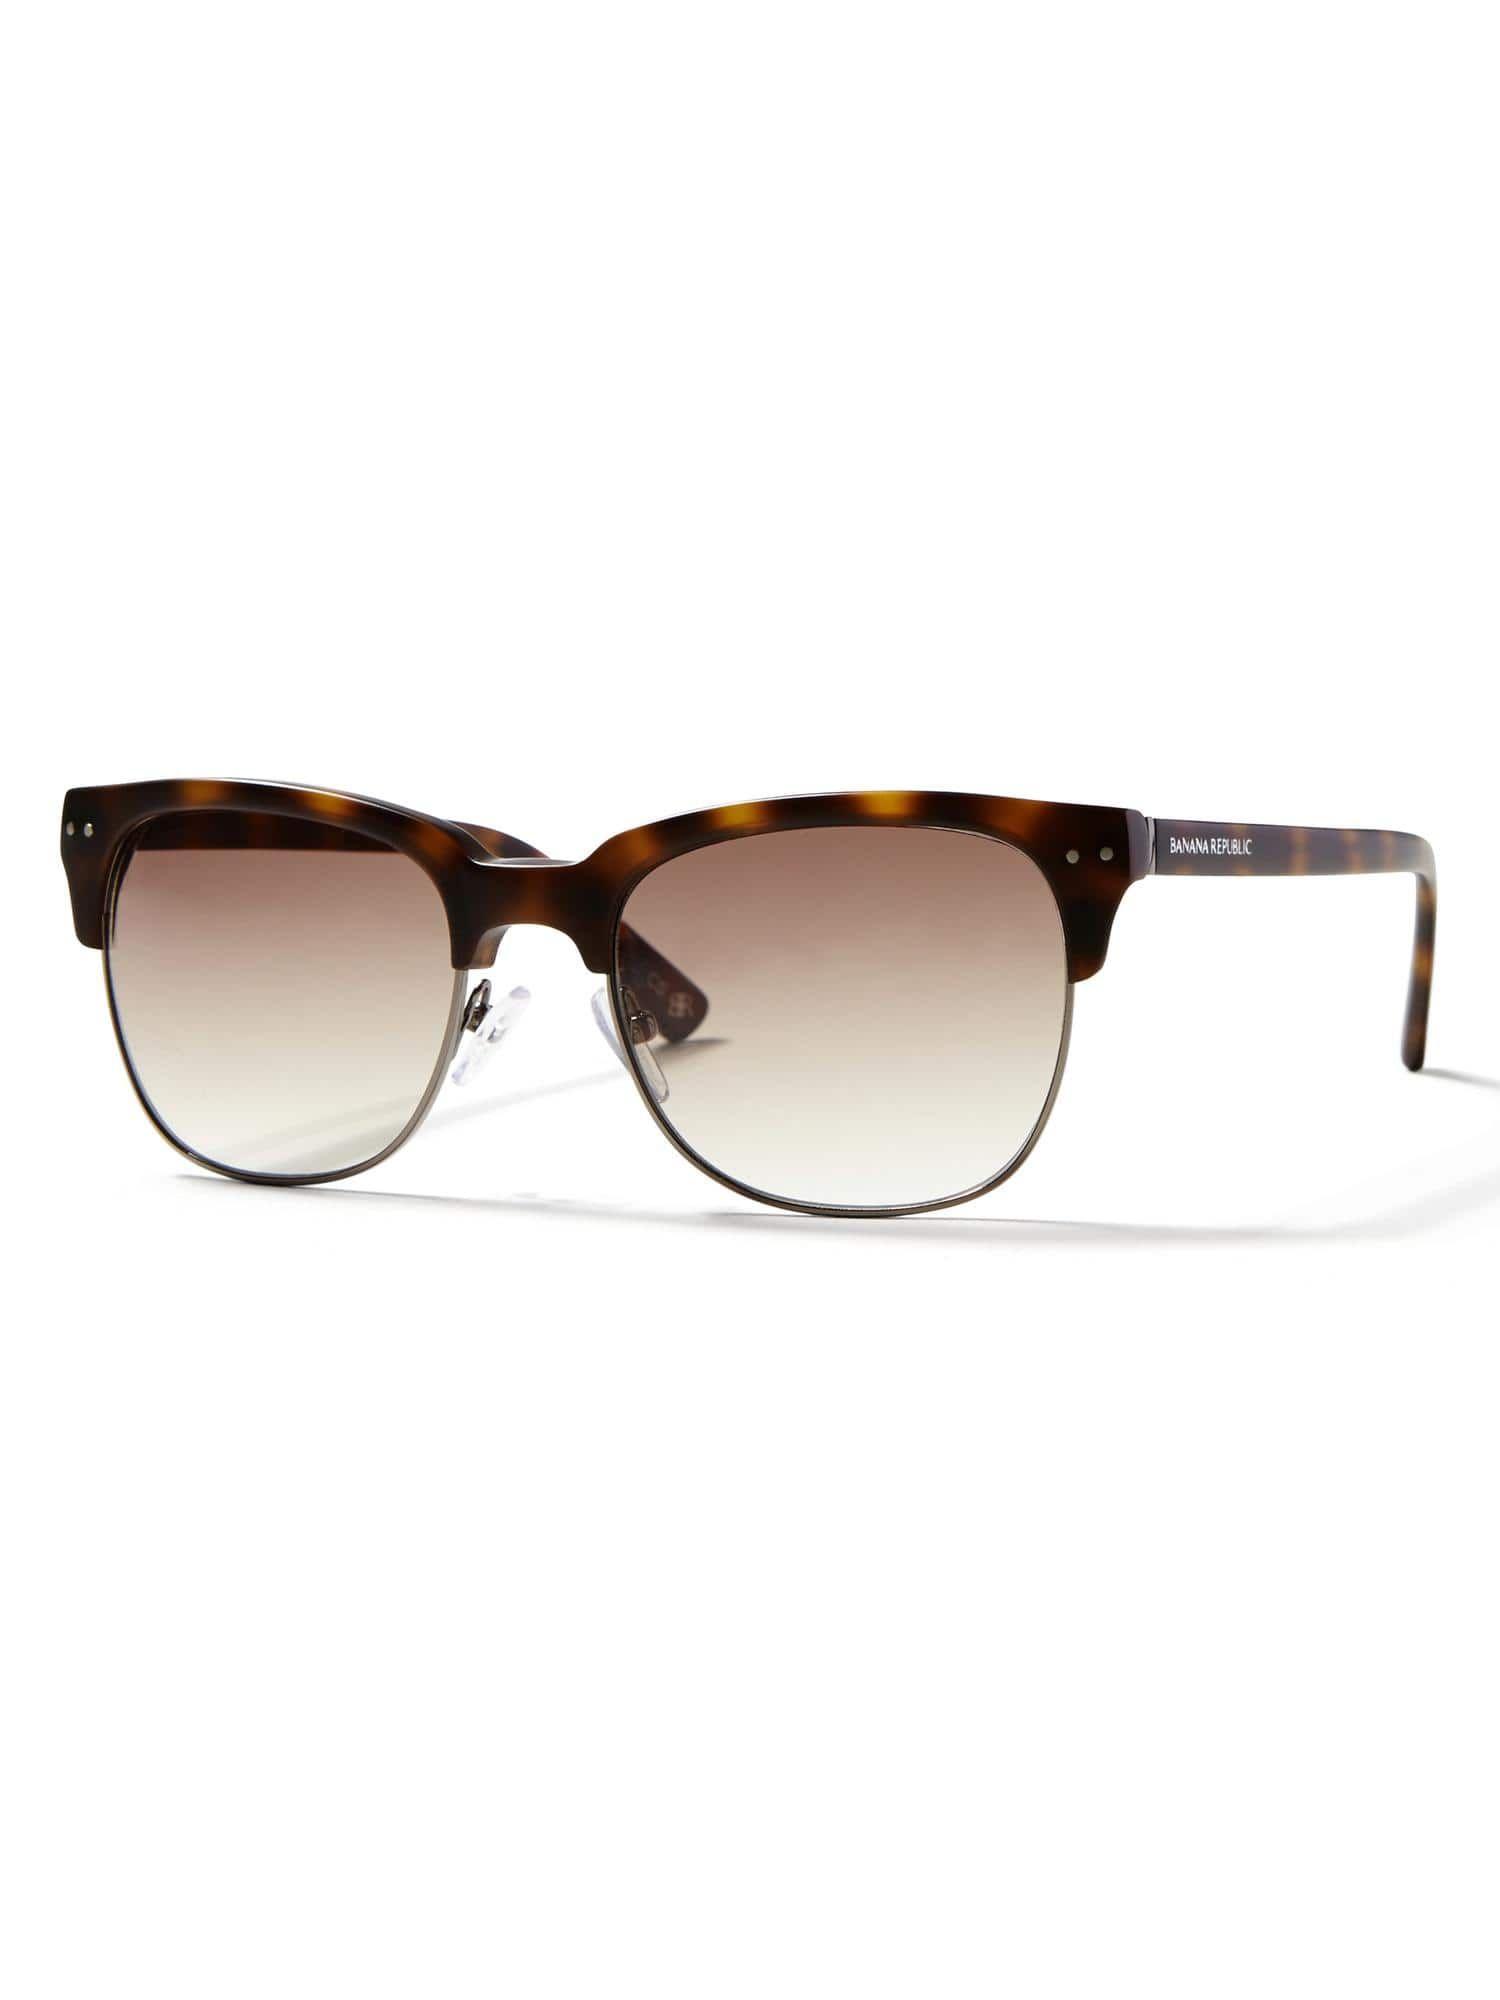 Xavier Sunglasses, Banana Republic, 100% UV protection.